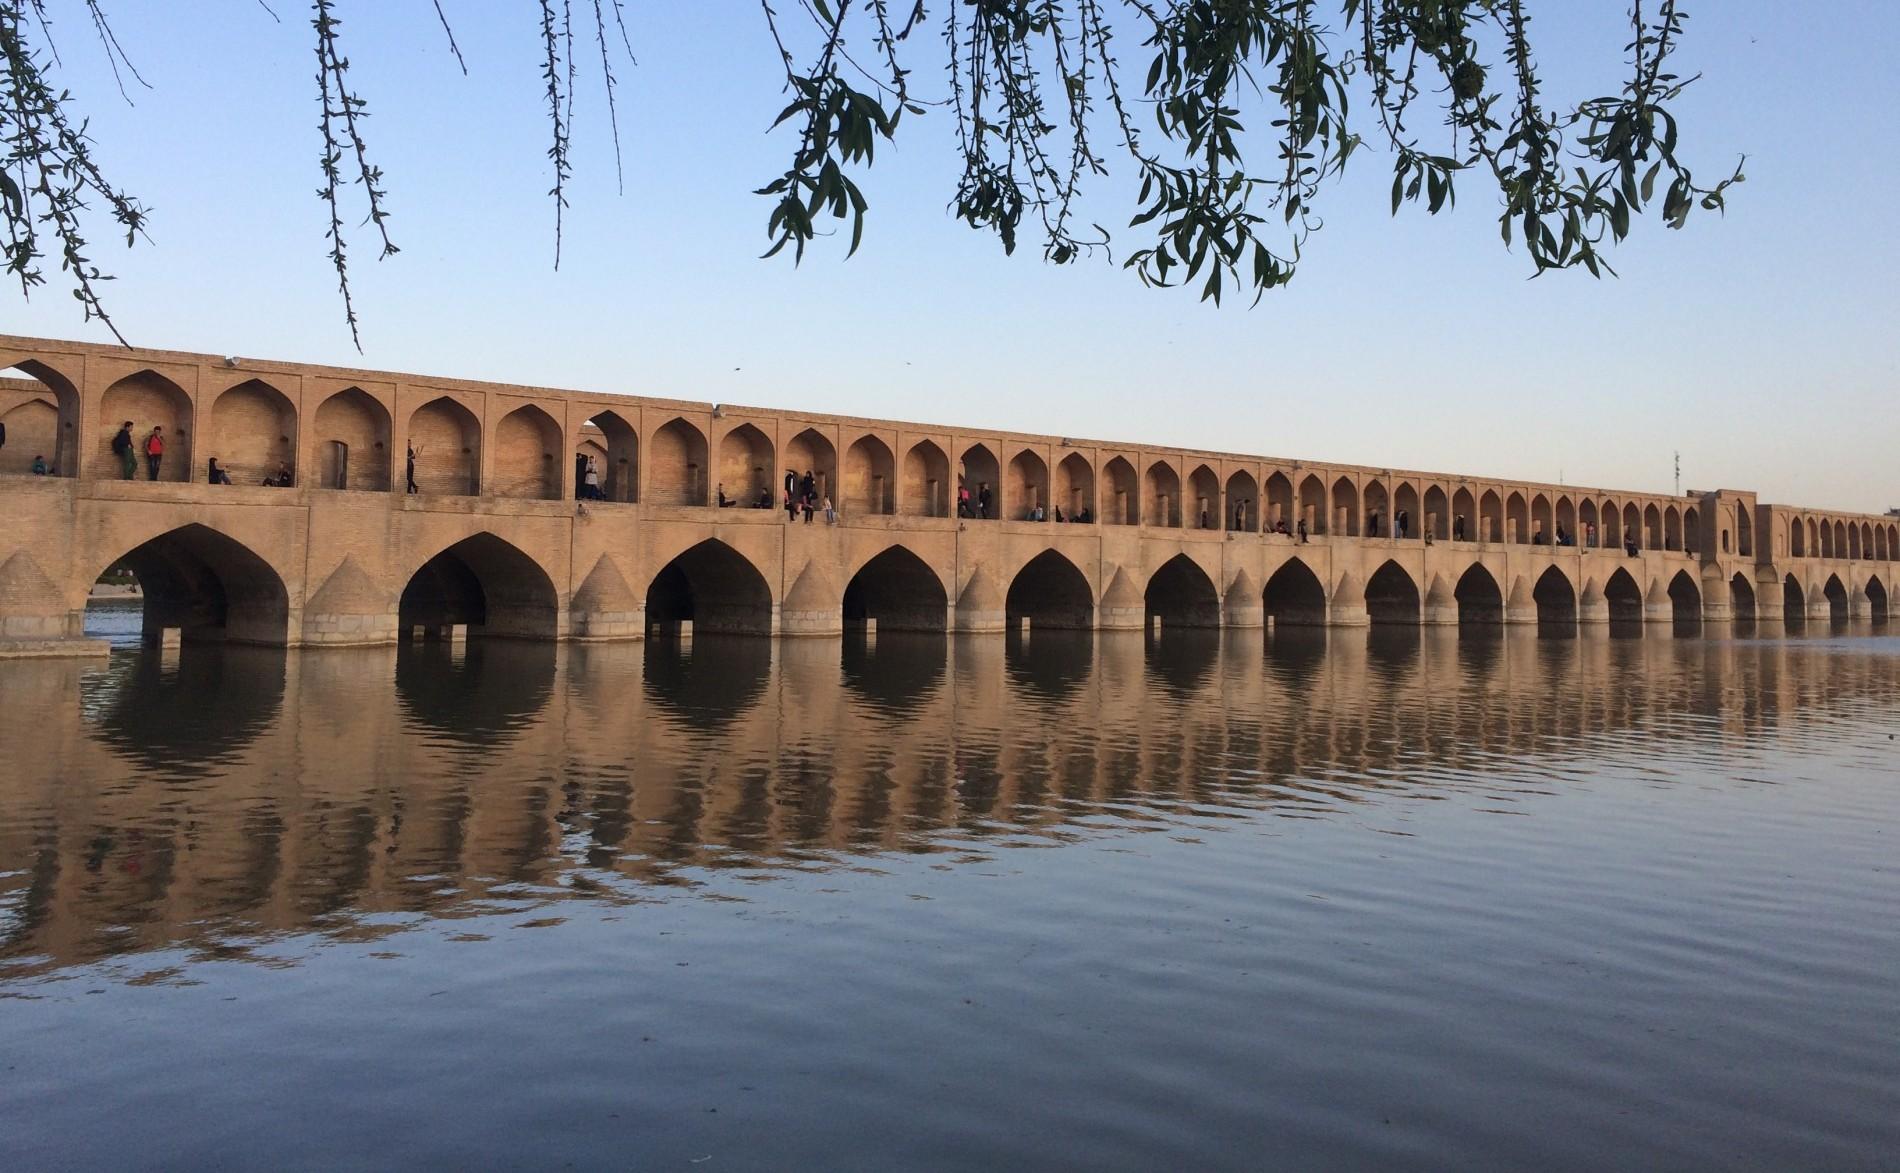 Si-o-seh pol bridge, Isfahan by day. Photo by Chiara Ferroni.